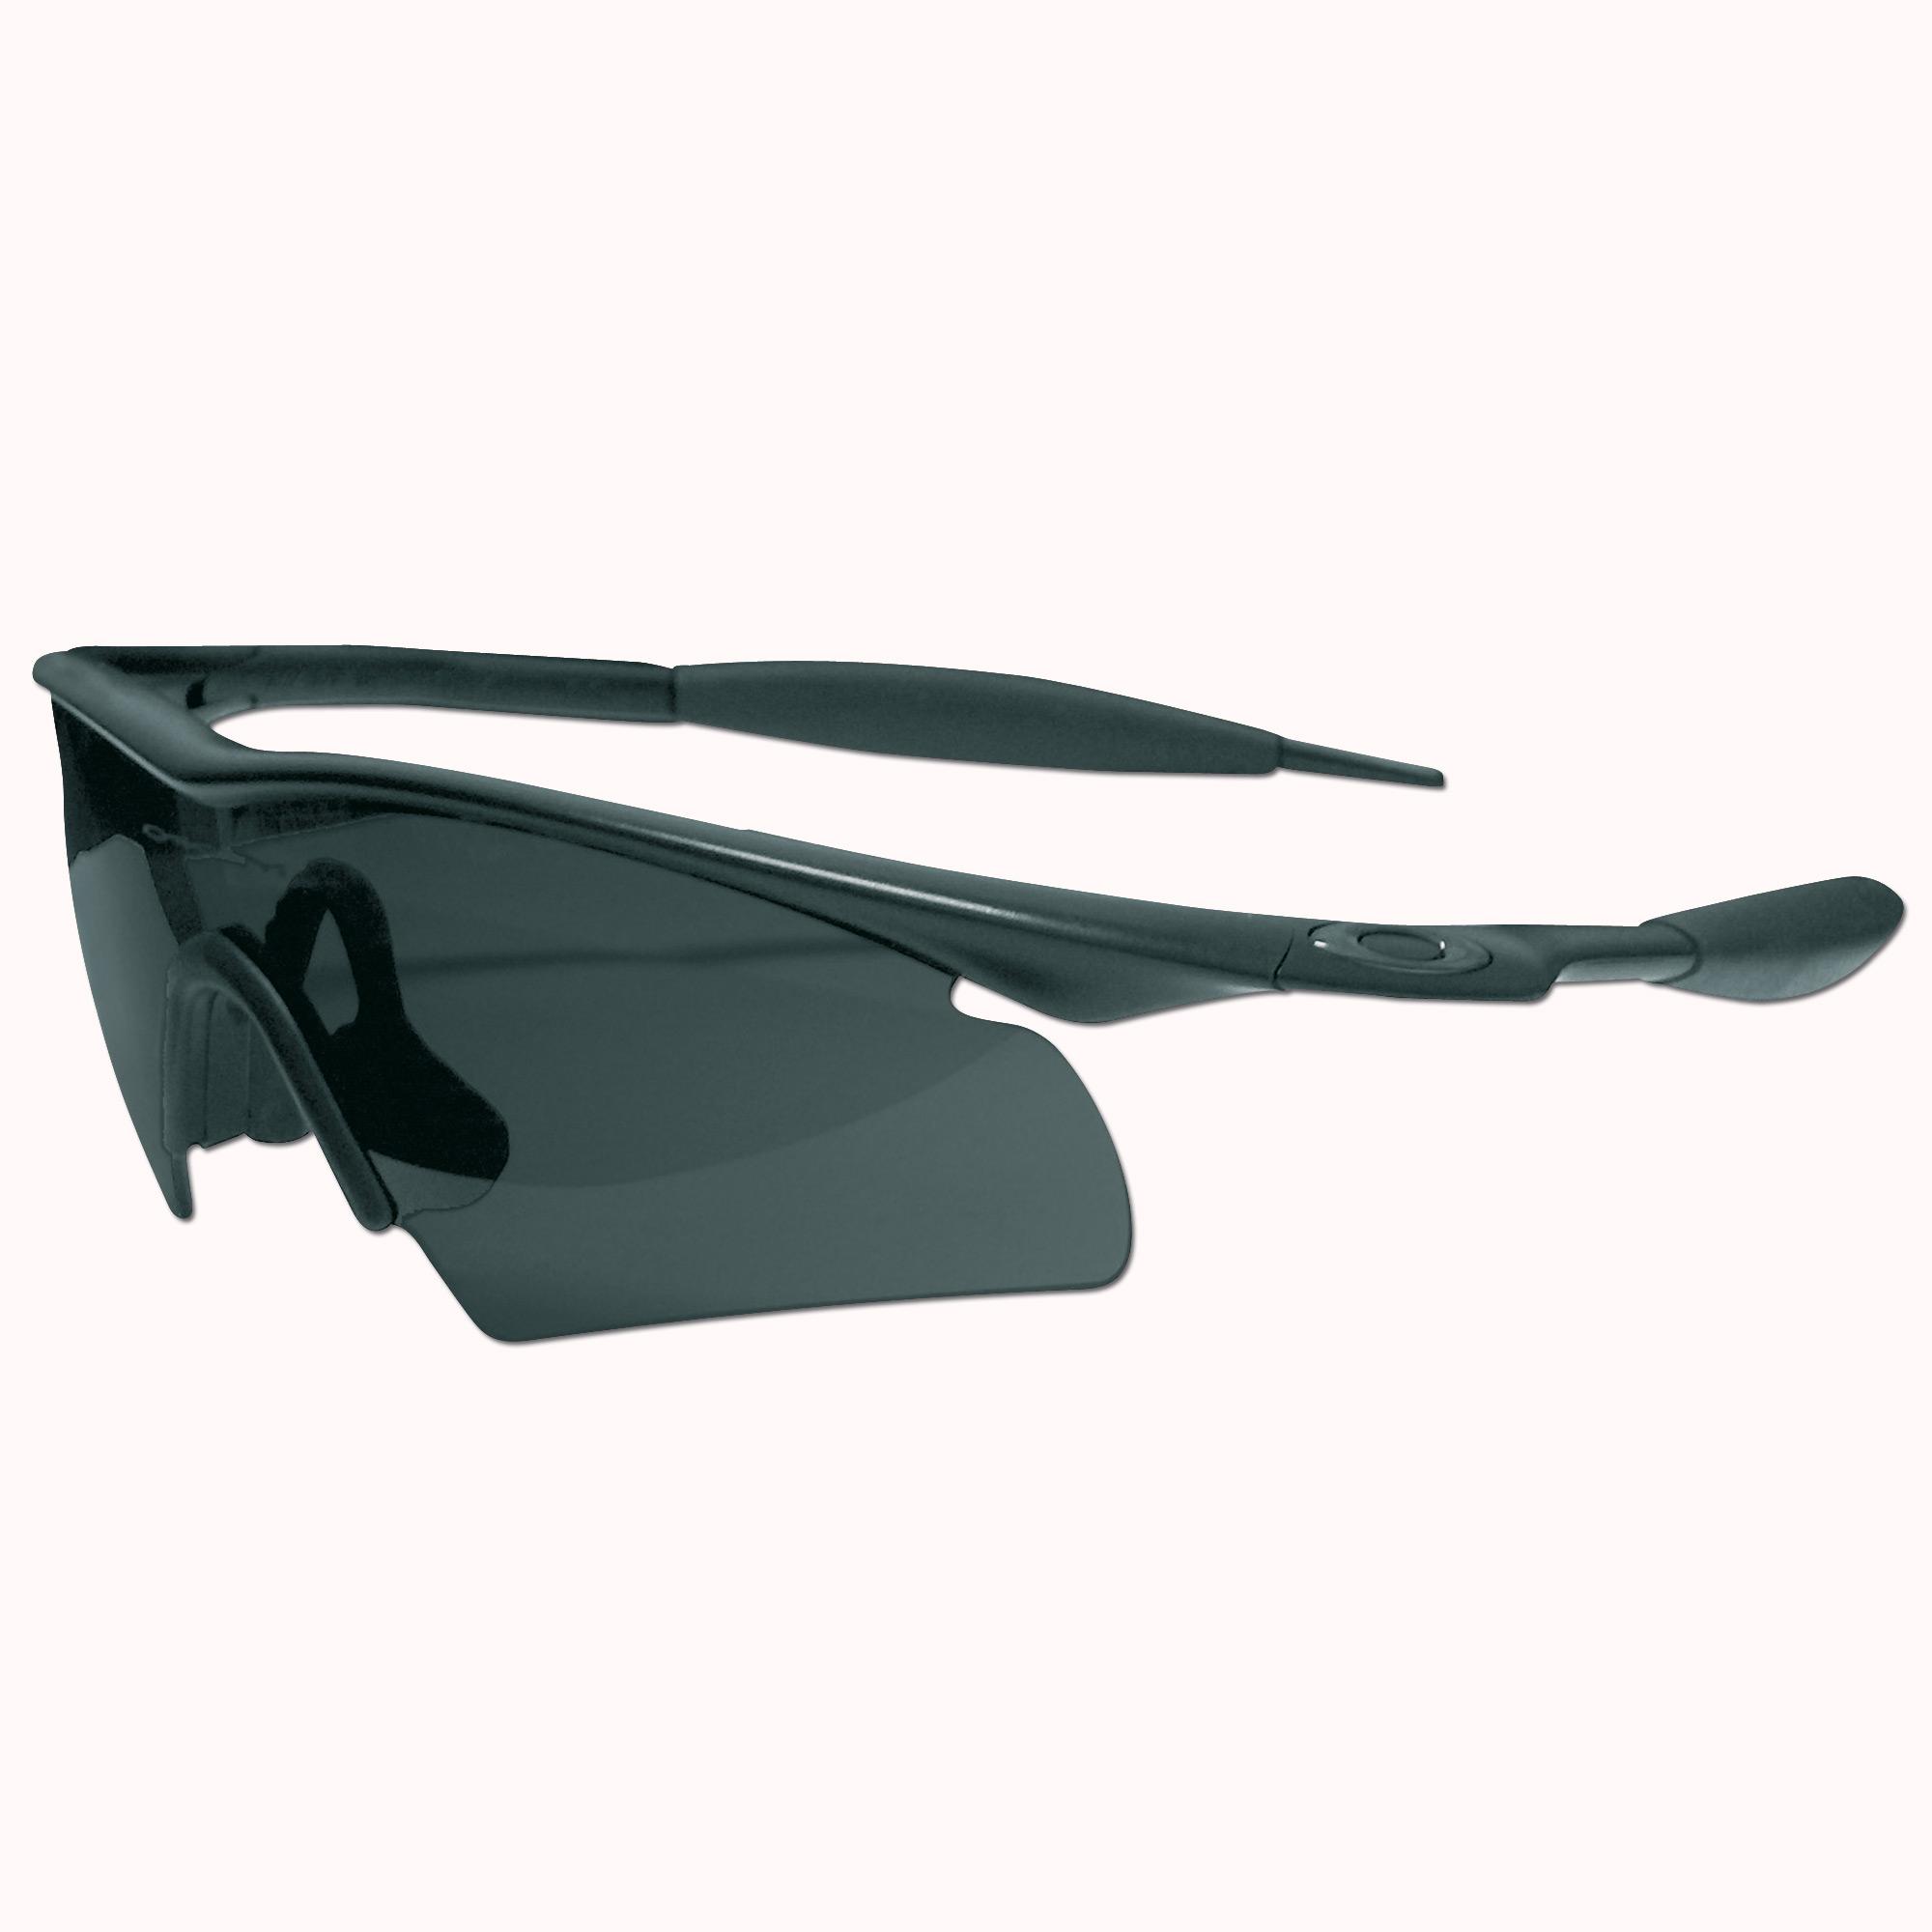 Sonnenbrille Oakley M-Frame Hybrid black/grey